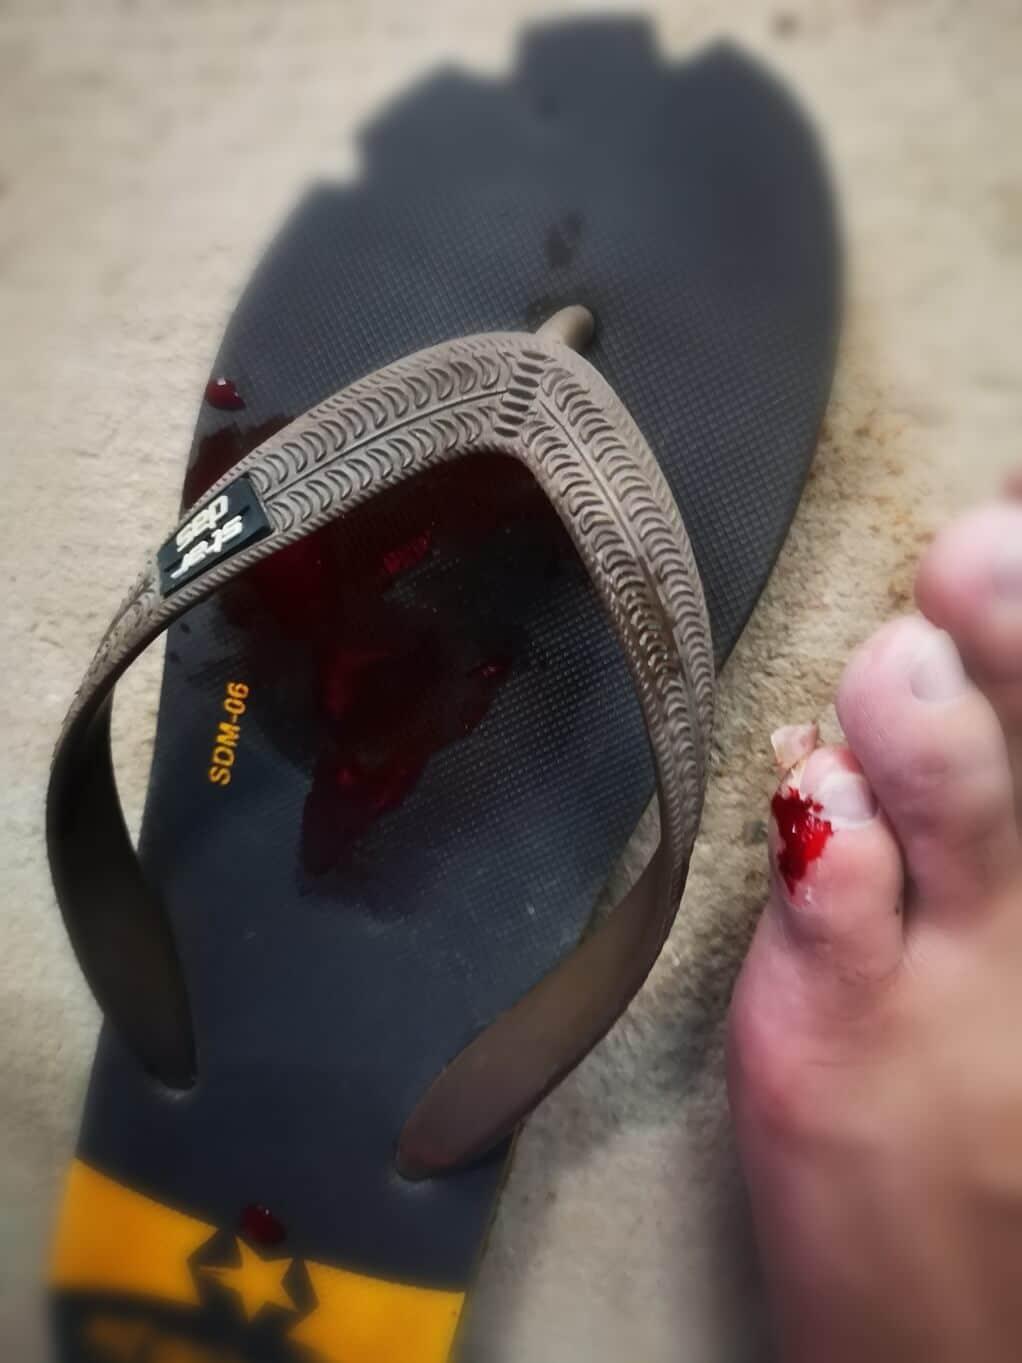 Chris toe injury